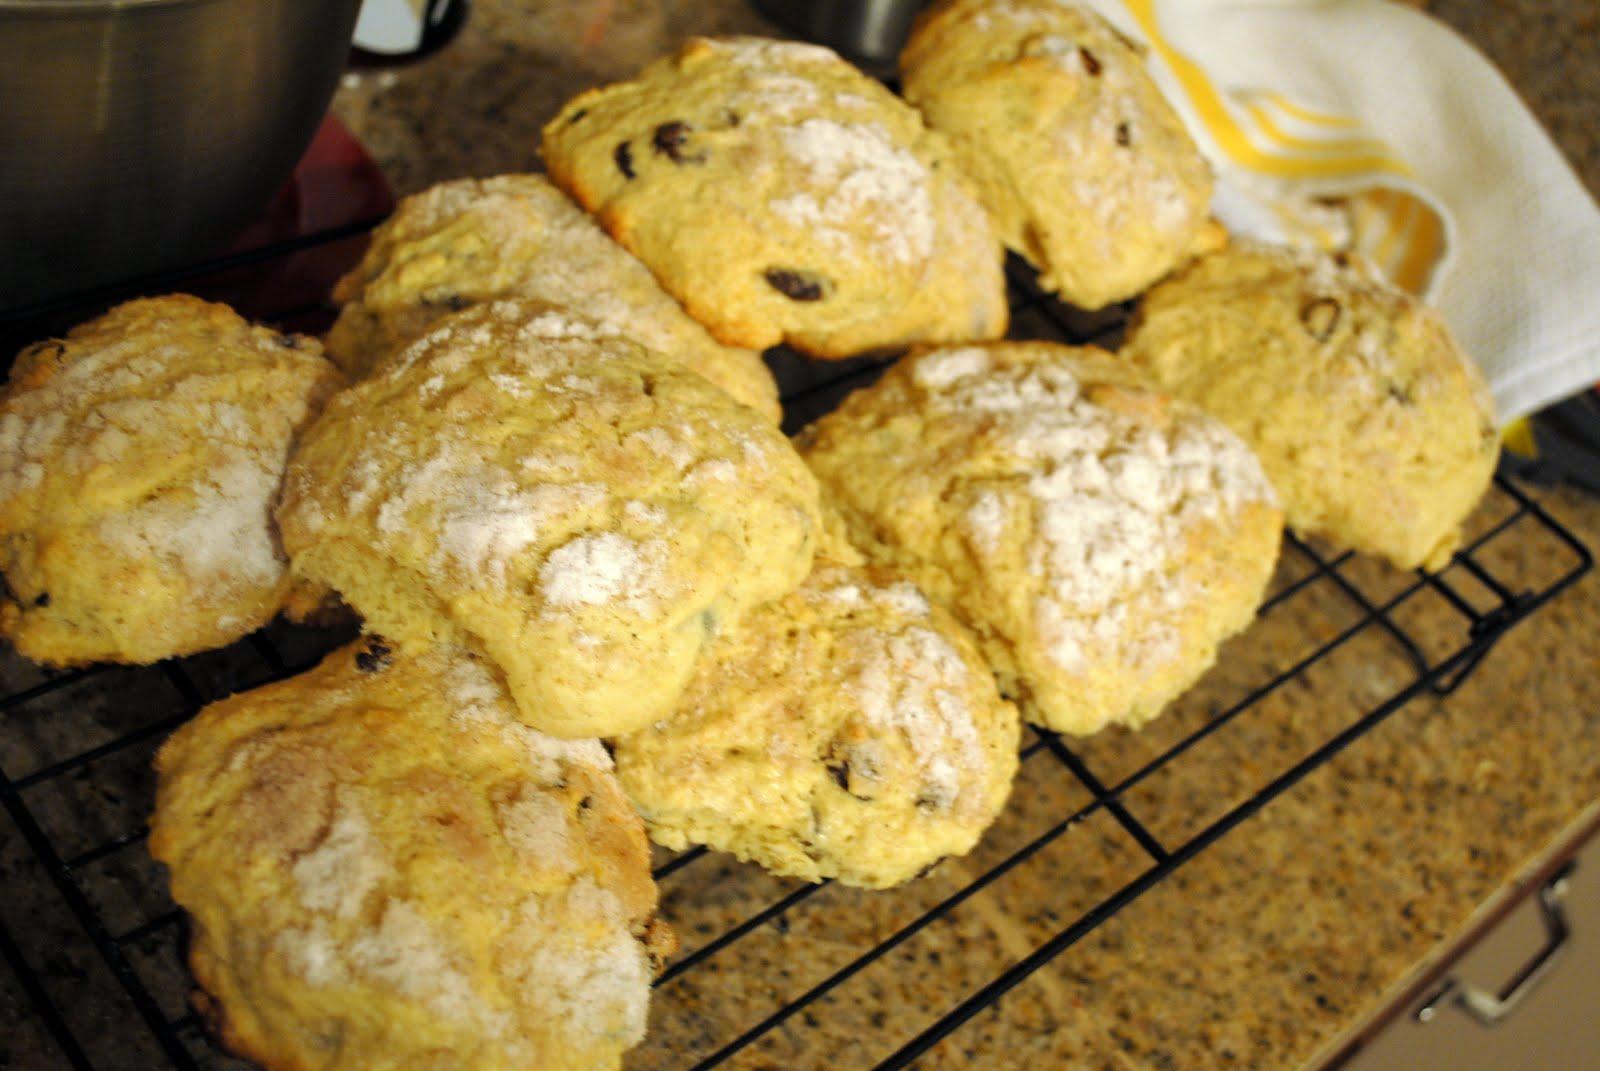 Rock Cake Recipe Low Sugar: Something Sweet: Hagrid's Rock Cakes And HARRY POTTER